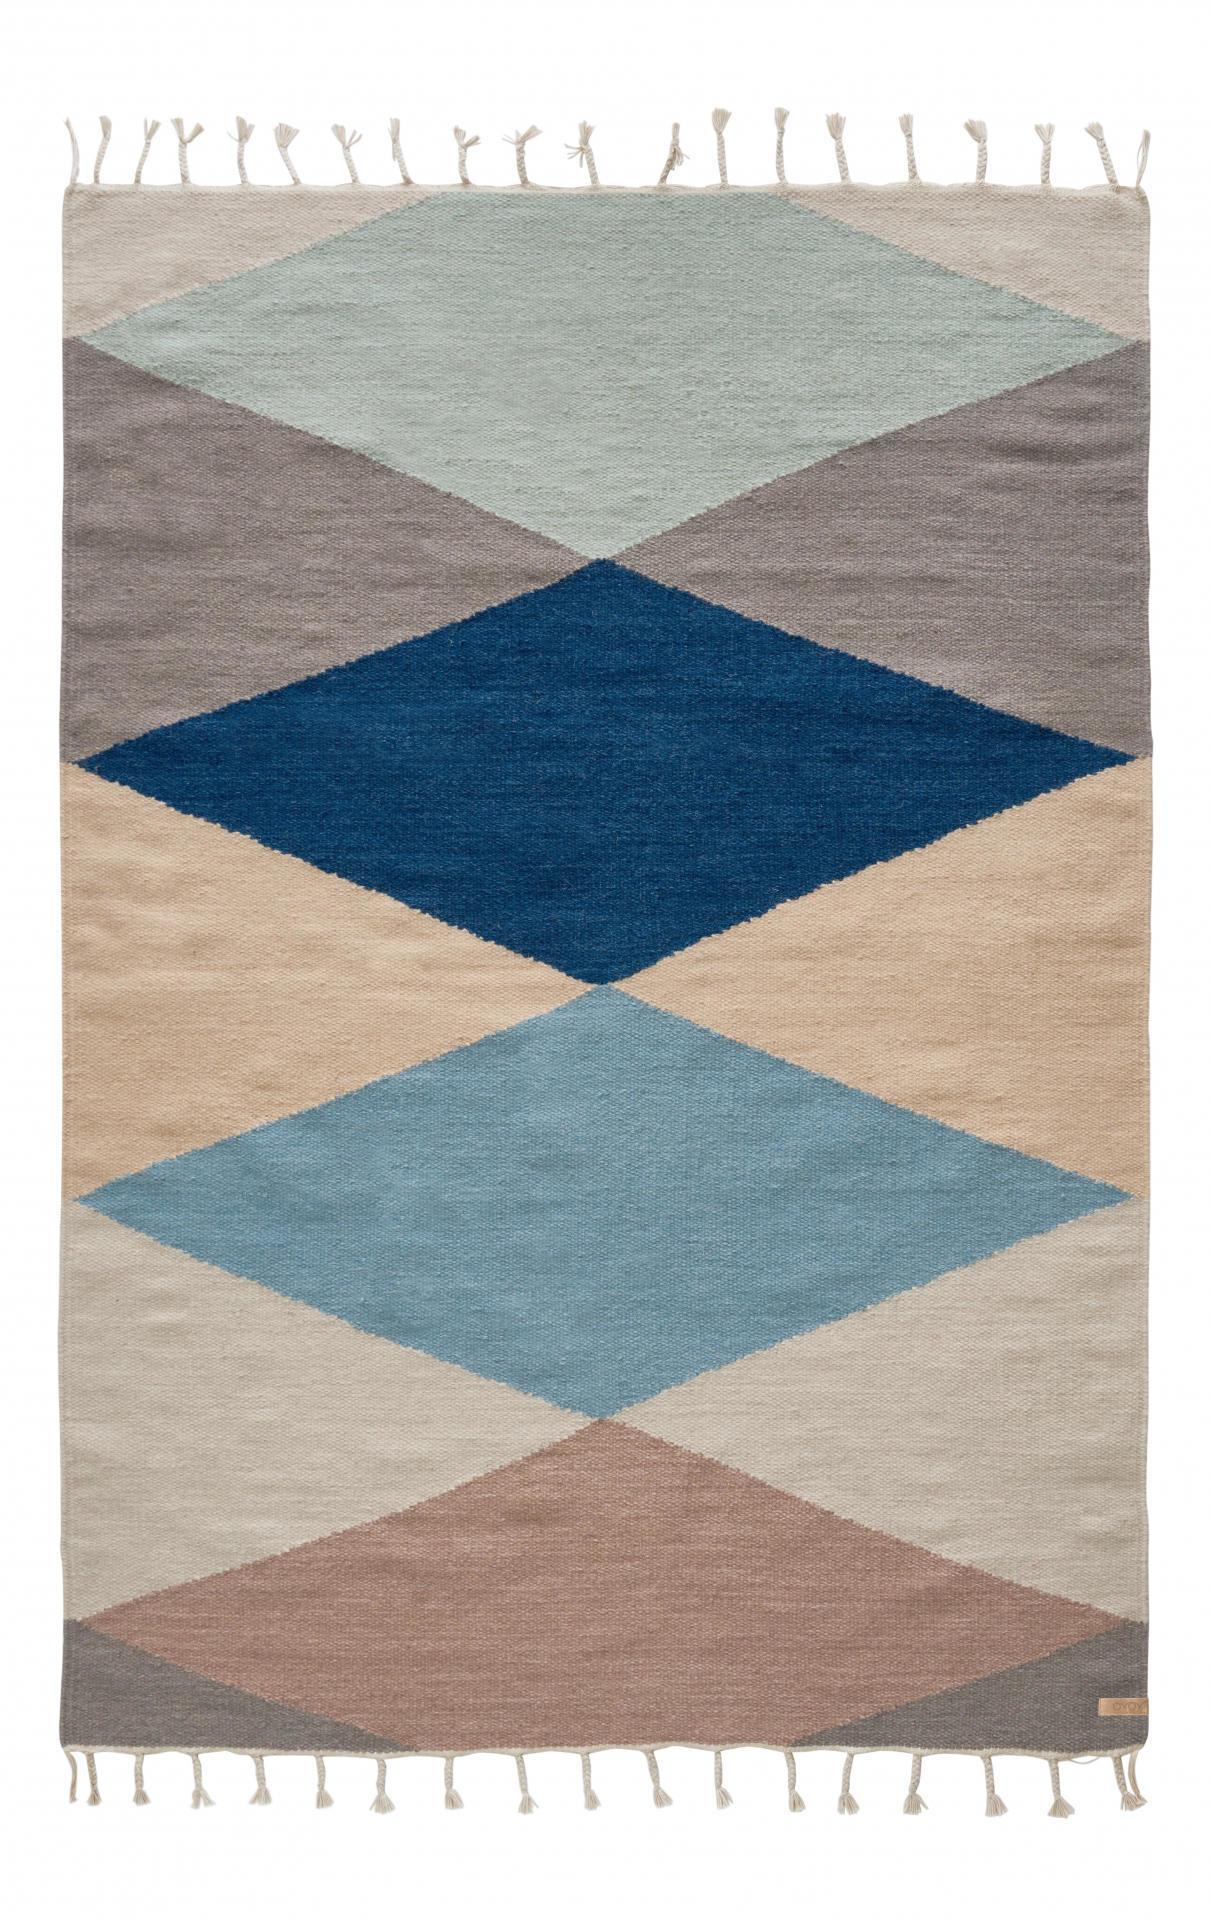 OYOY Vlněný koberec Hip 170x120 cm, modrá barva, béžová barva, šedá barva, multi barva, krémová barva, textil